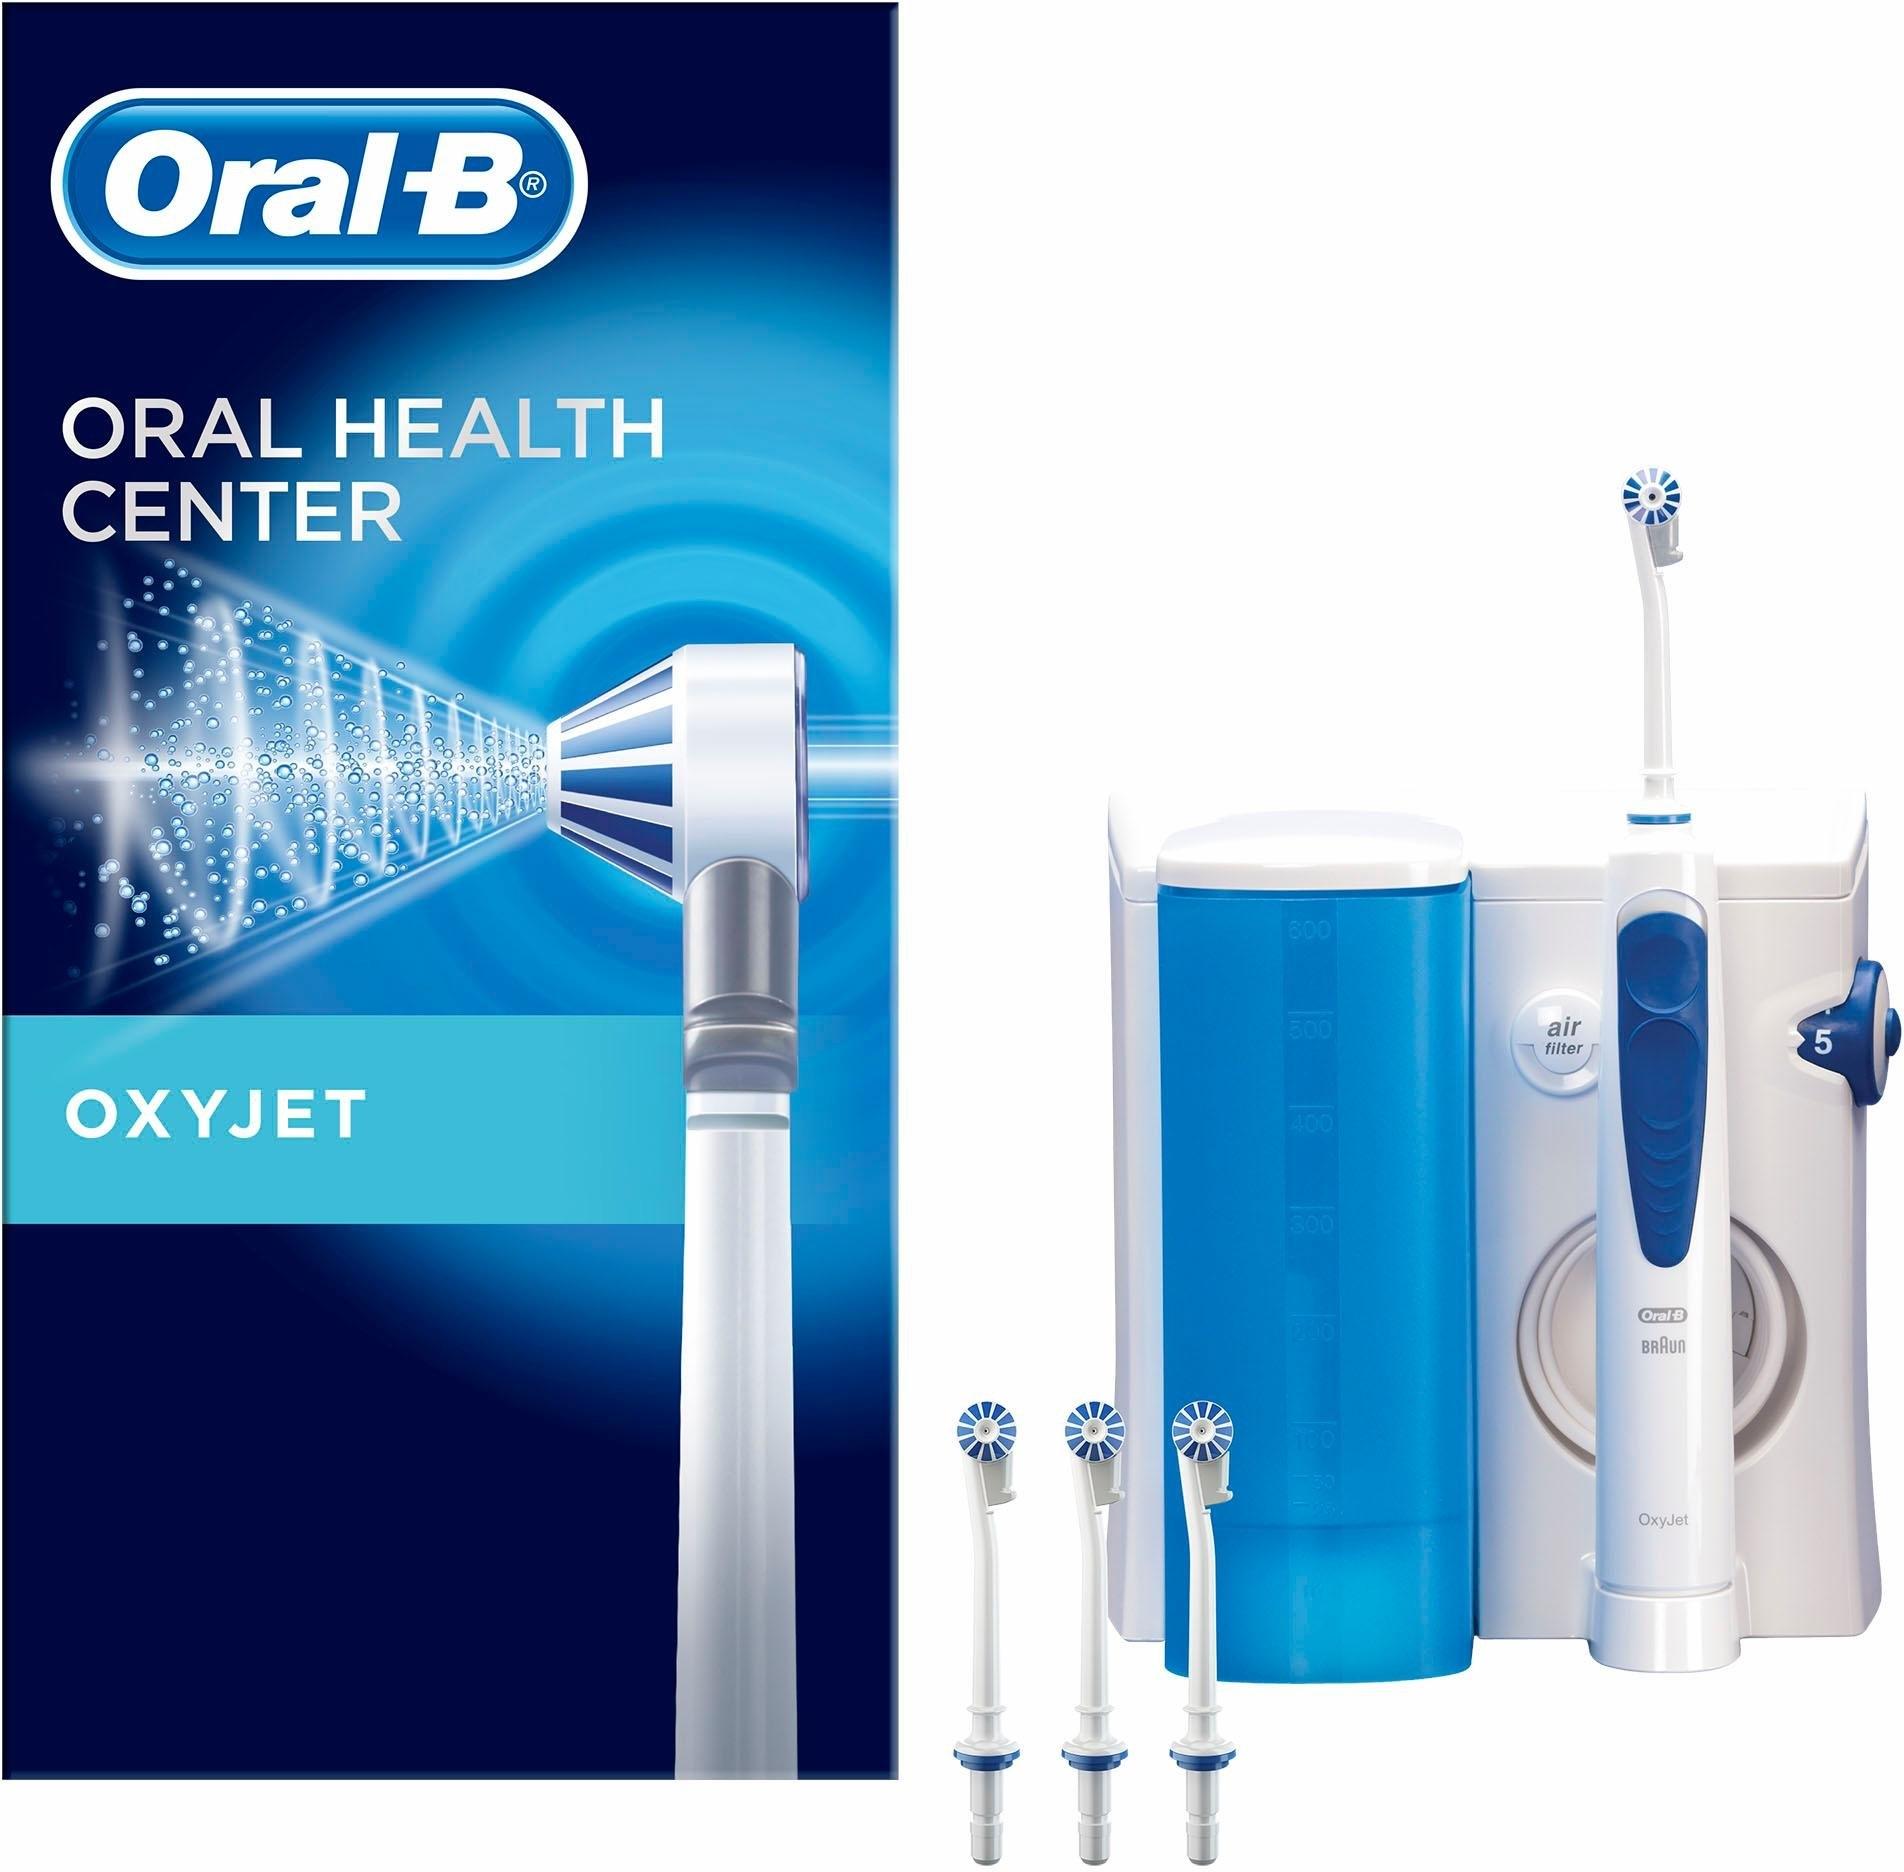 Oral B monddouche OxyJet - gratis ruilen op otto.nl